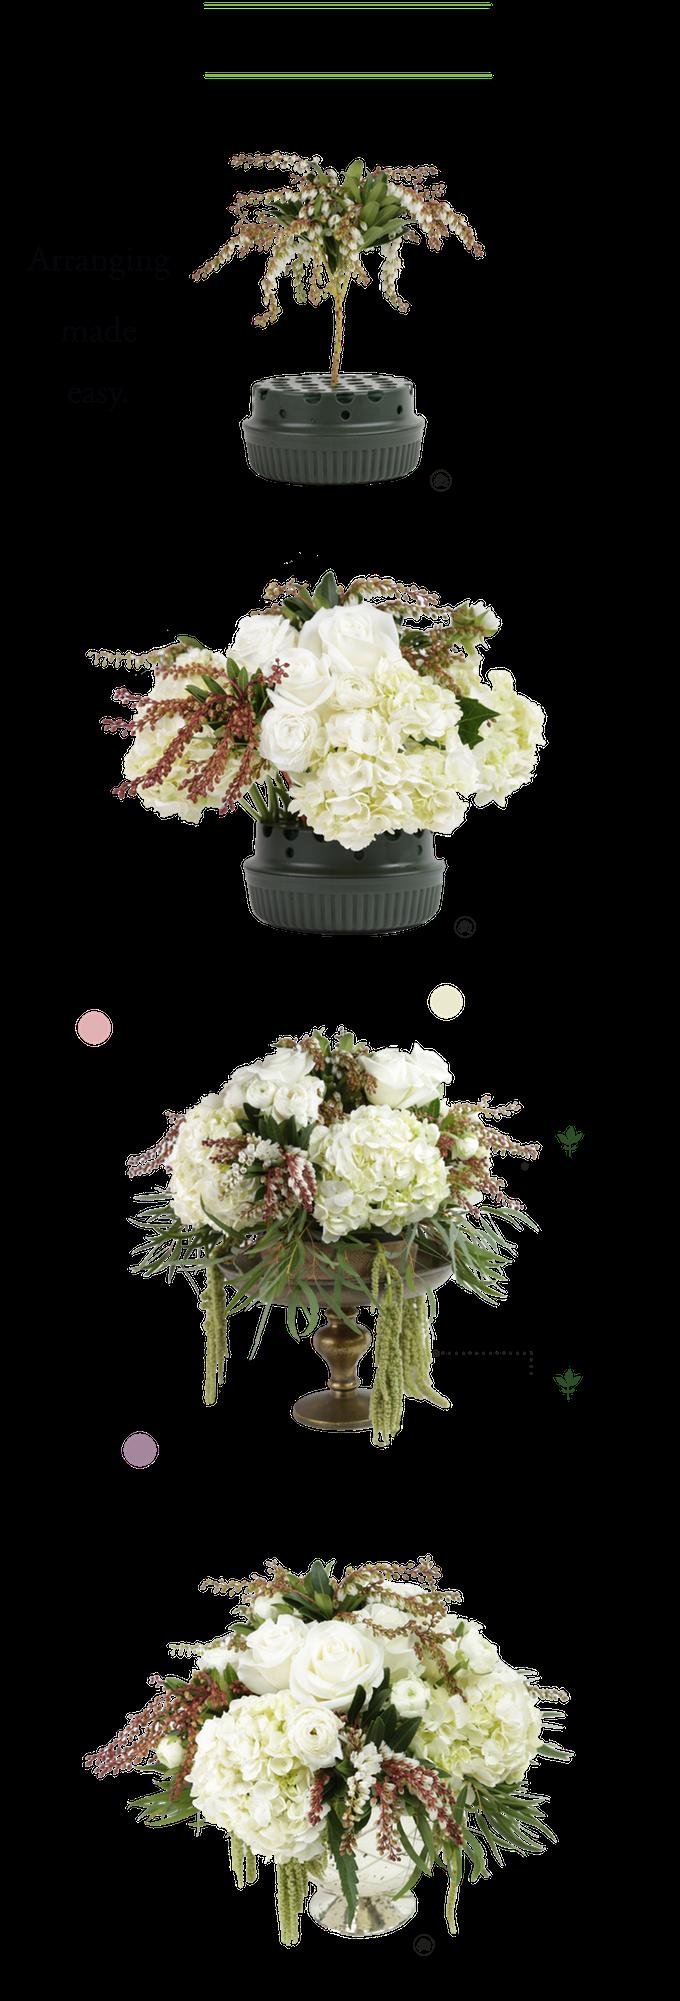 A reusable do it yourself flower arranging kit with step by step a reusable do it yourself flower arranging kit with step by christmas centerpiecesfloral solutioingenieria Gallery